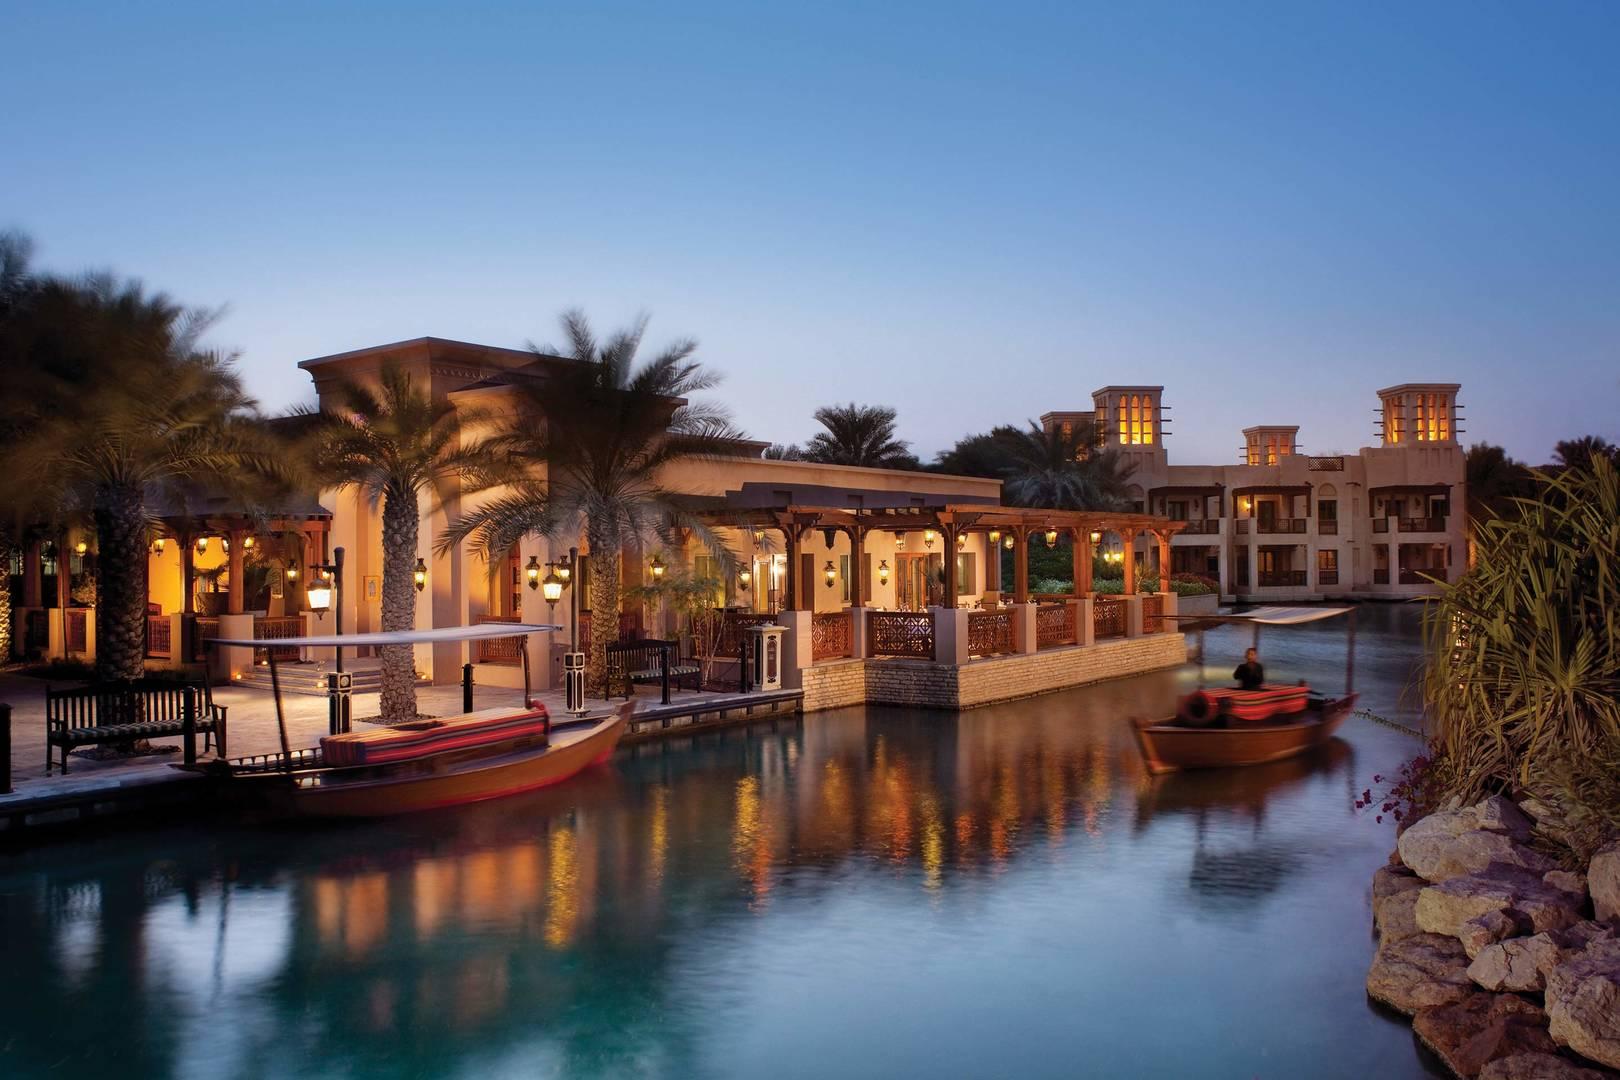 https://cdn.jumeirah.com/-/mediadh/DH/Hospitality/Jumeirah/Occasion/Dubai/Magnolia/Magnolia-terrace-harbor-view_EXTENDED_6-4.jpg?h=1080&w=1620&hash=F540E3649395C6D0D214A08FECFE6607